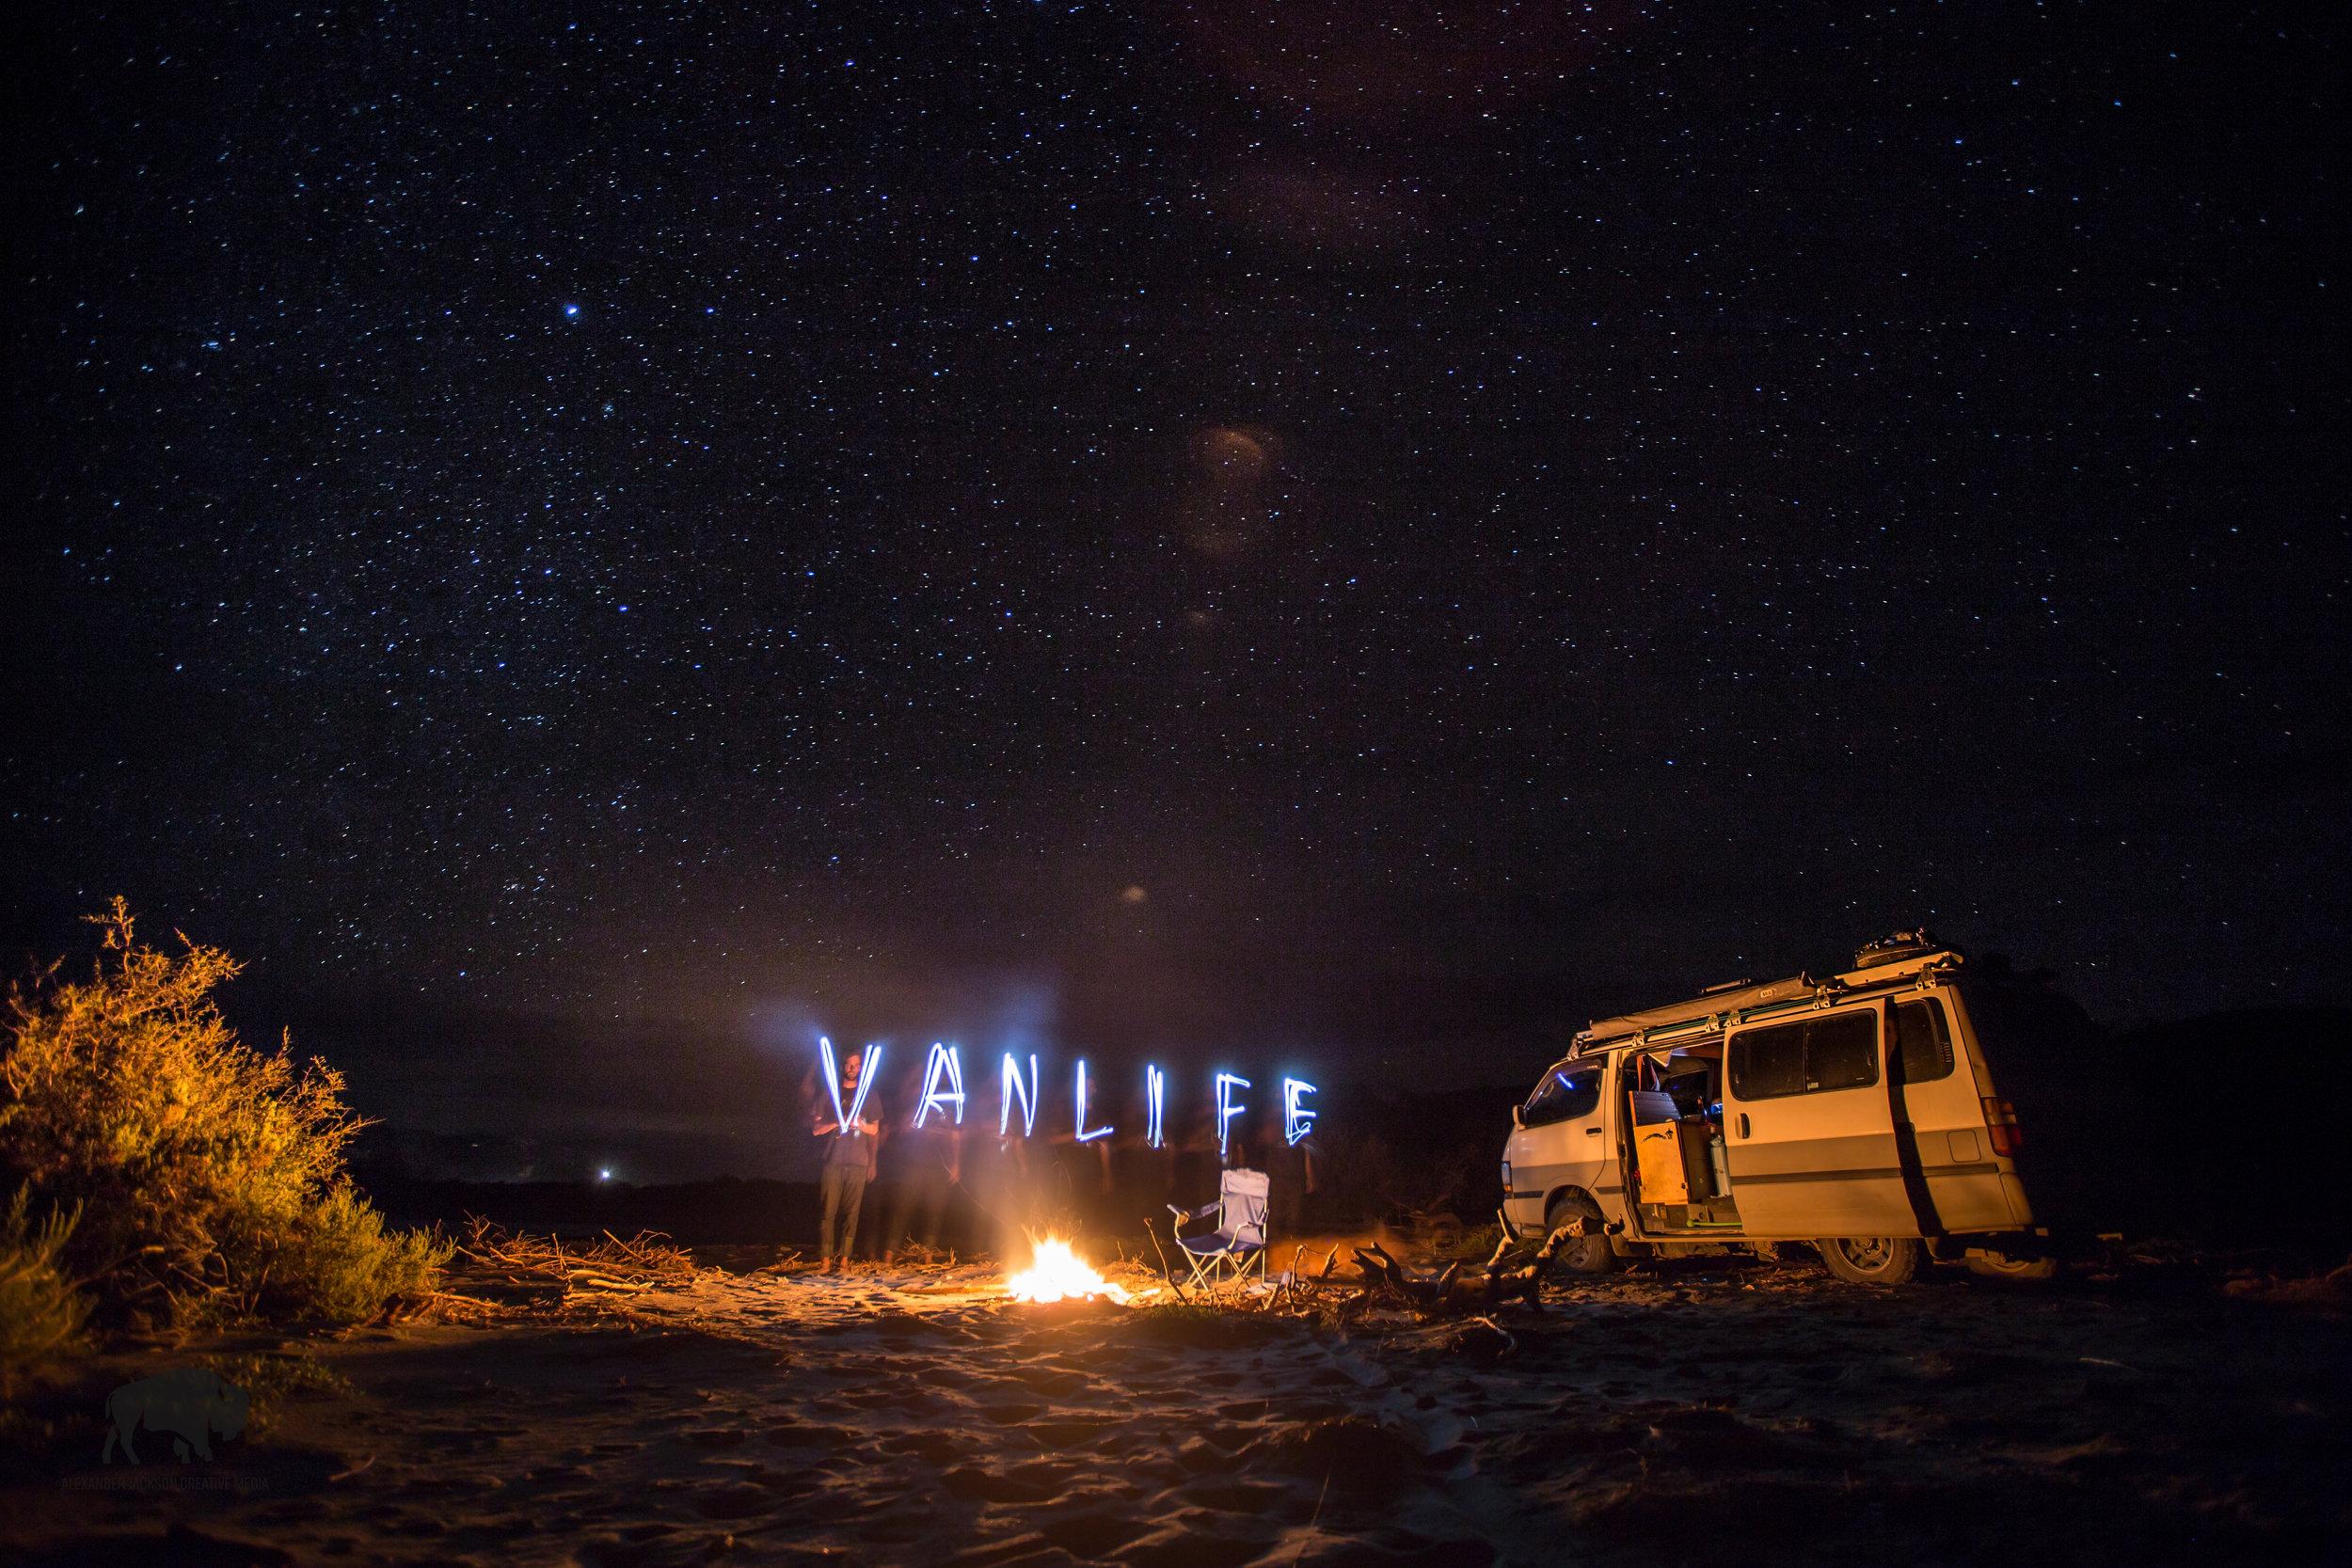 Getting in the spirit of van life.